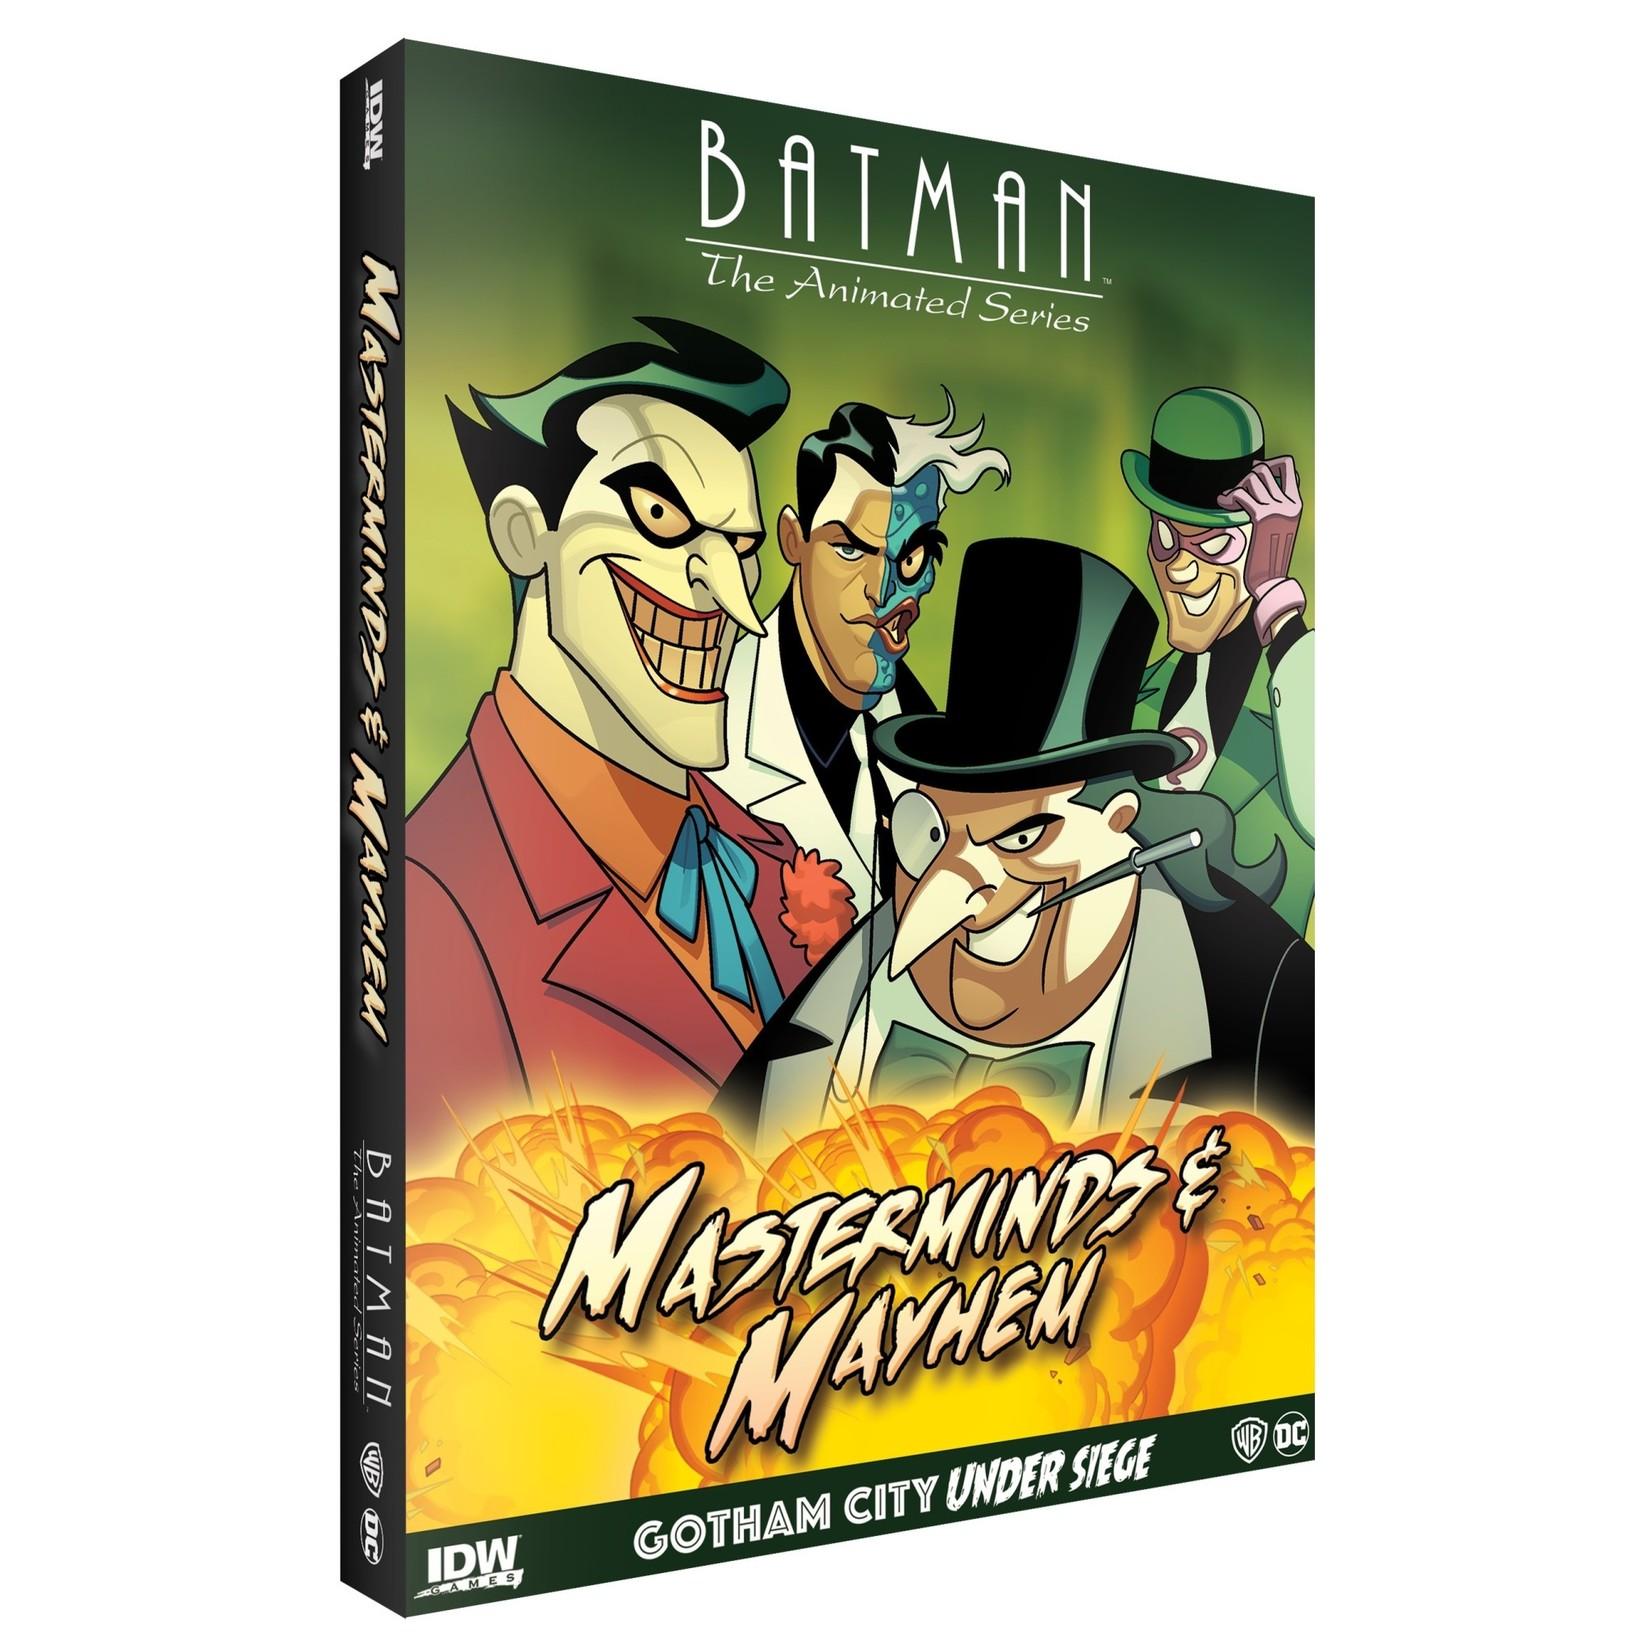 IDW Publishing Batman Gotham City Under Siege Masterminds and Mayhem